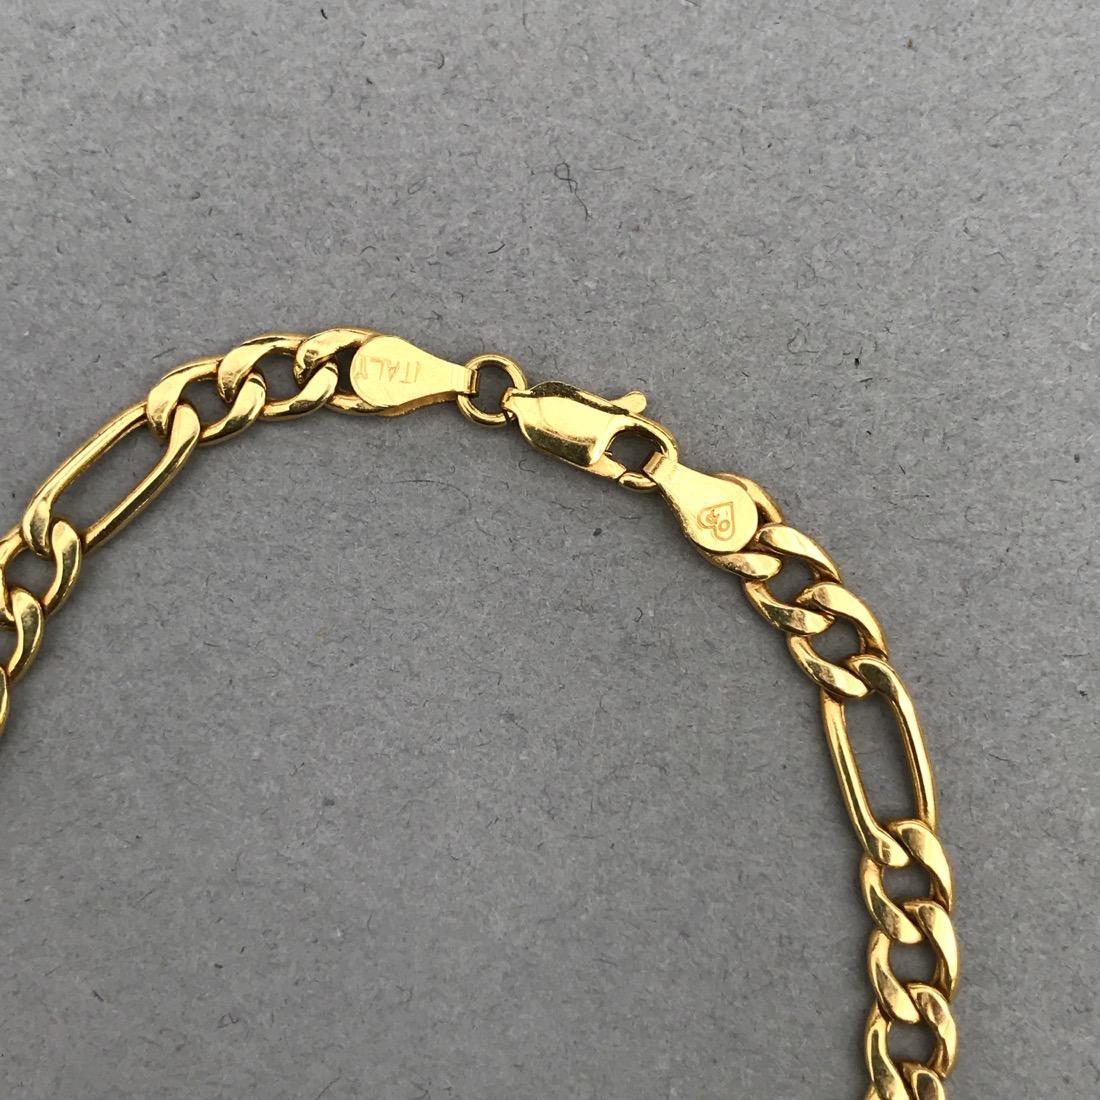 14K Gold Chain Link Bracelet - 2